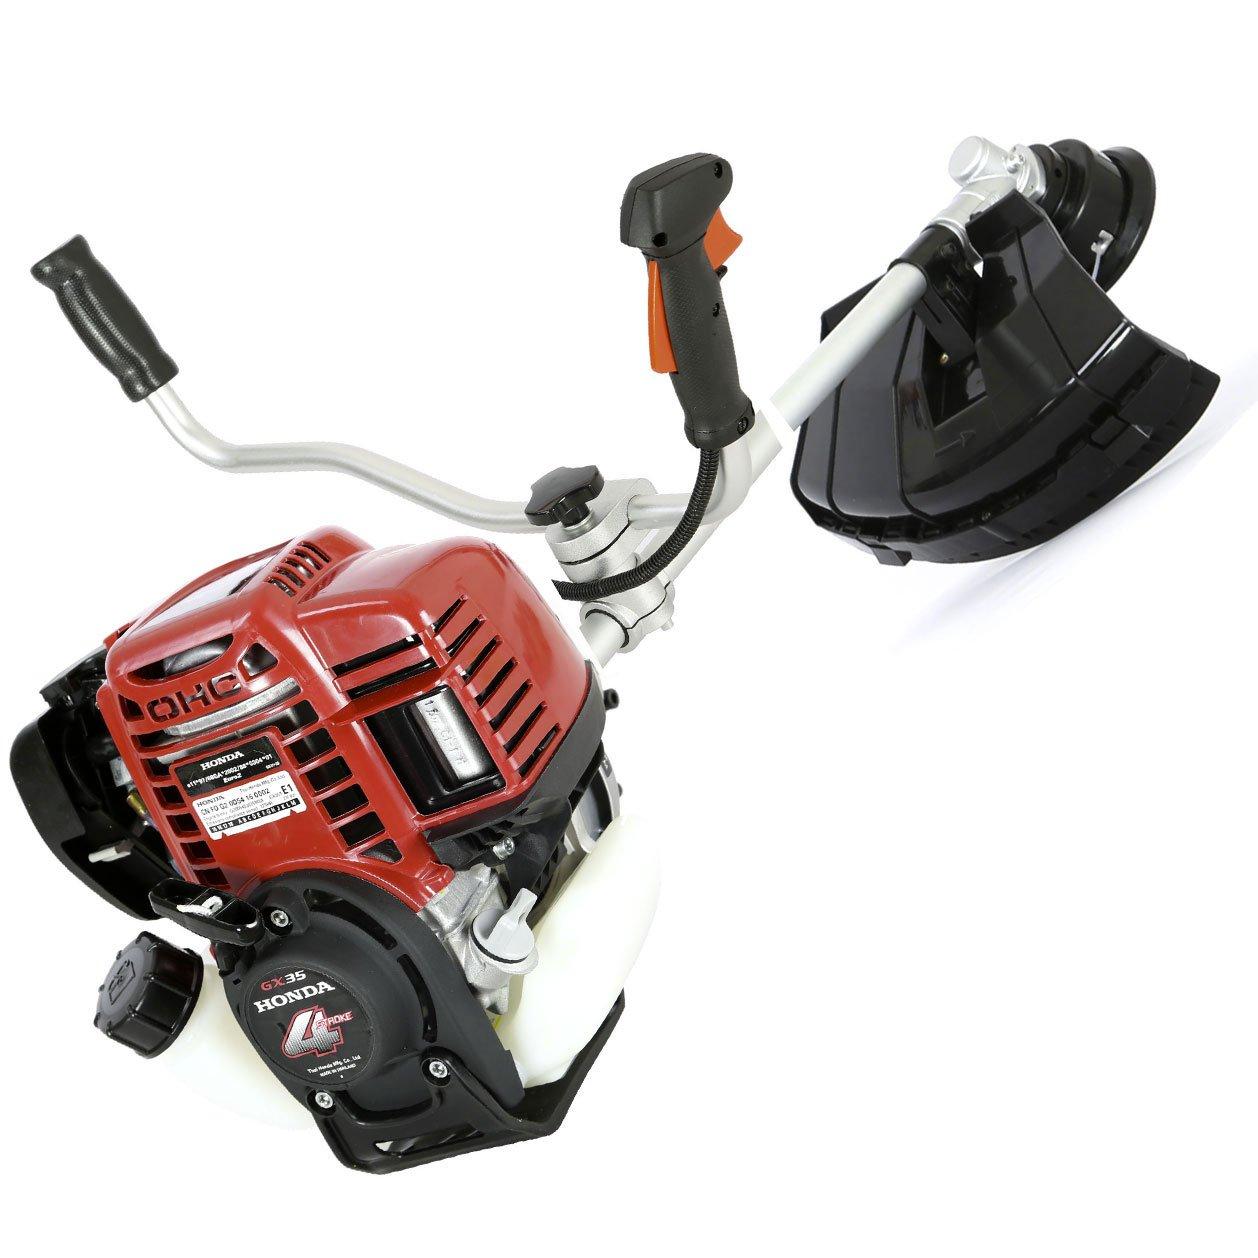 Decespugliatore motore HONDA GX35 impugnatura doppia: Amazon ...